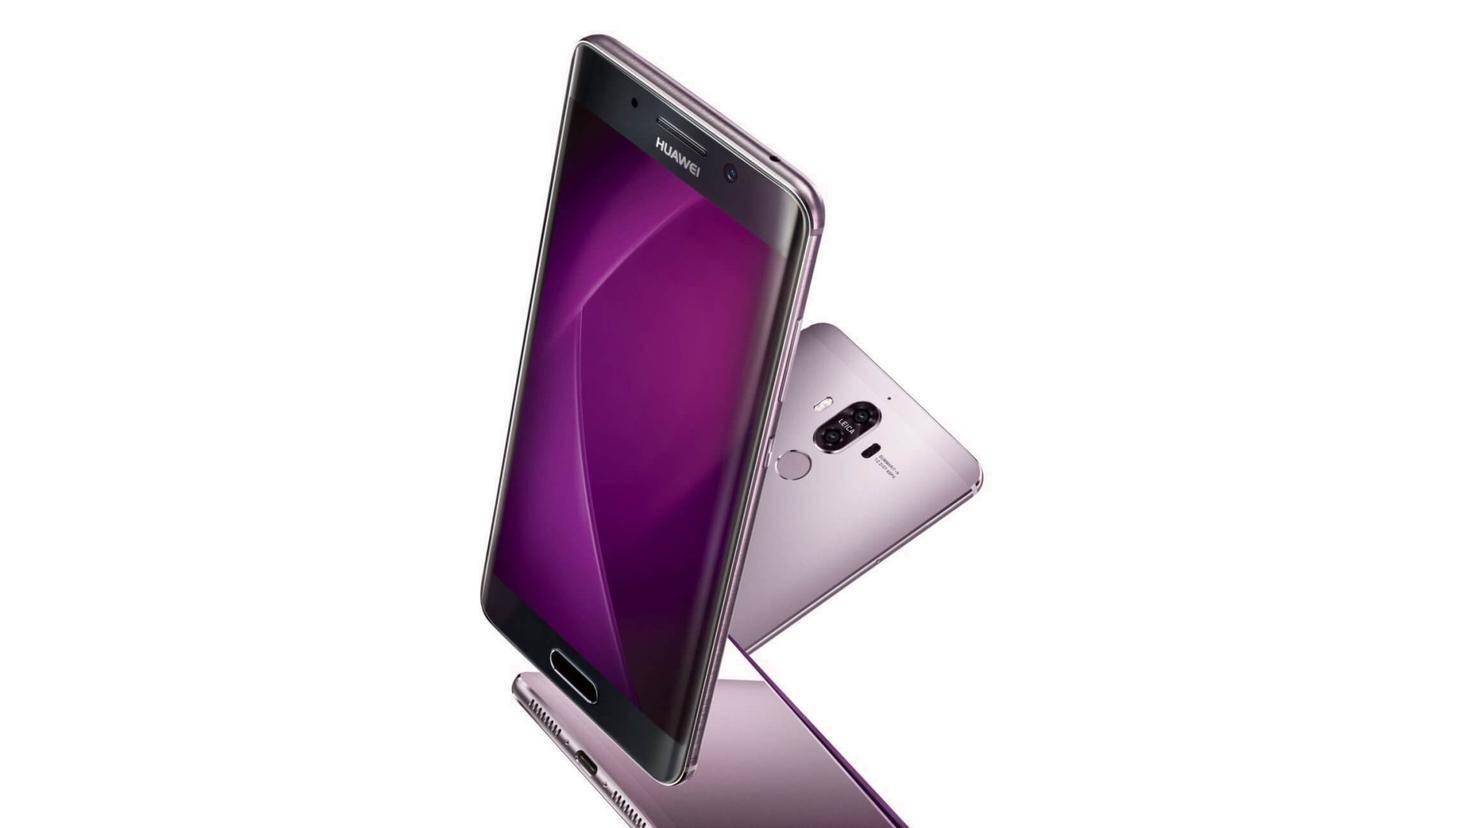 Huawei_Mate_9_Pro